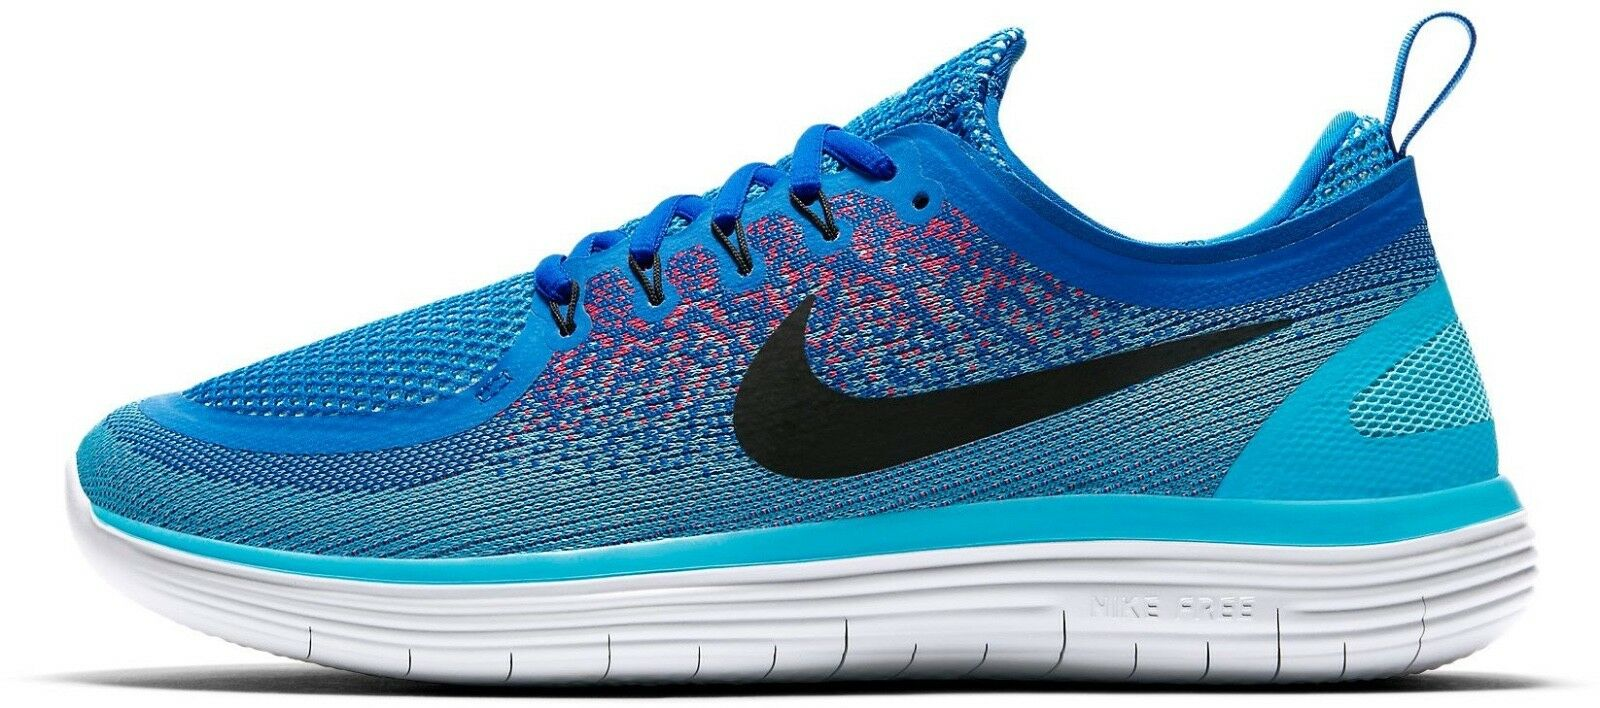 Nike Free Hombre rn distancia 2 para Hombre Free Correr Entrenamiento Calzado (863775 403) e5c848